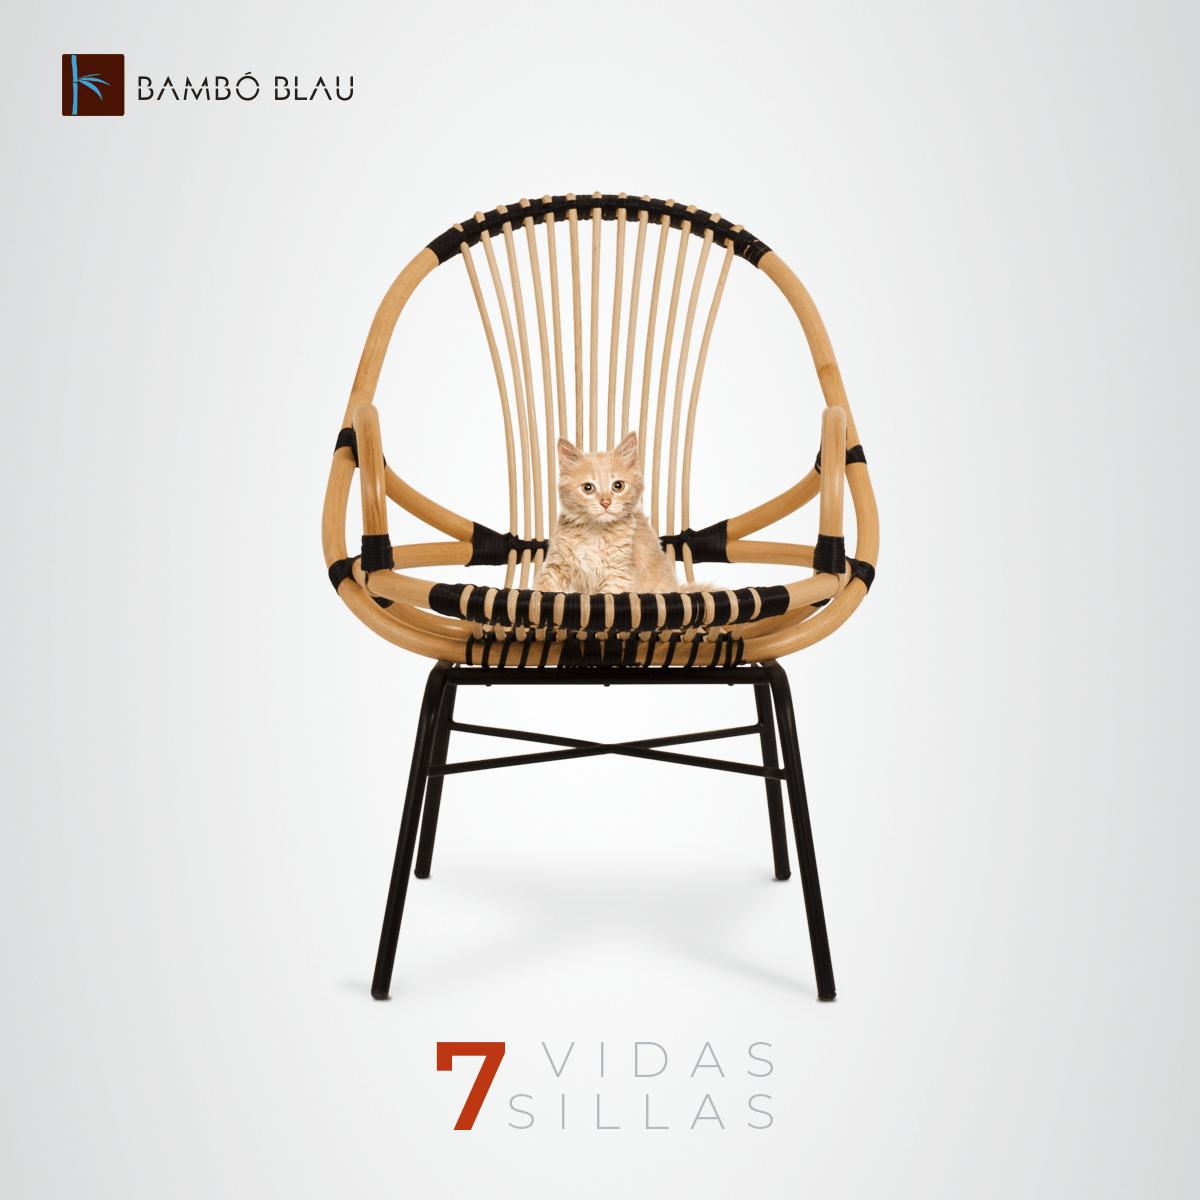 7 vidas, 7 sillas